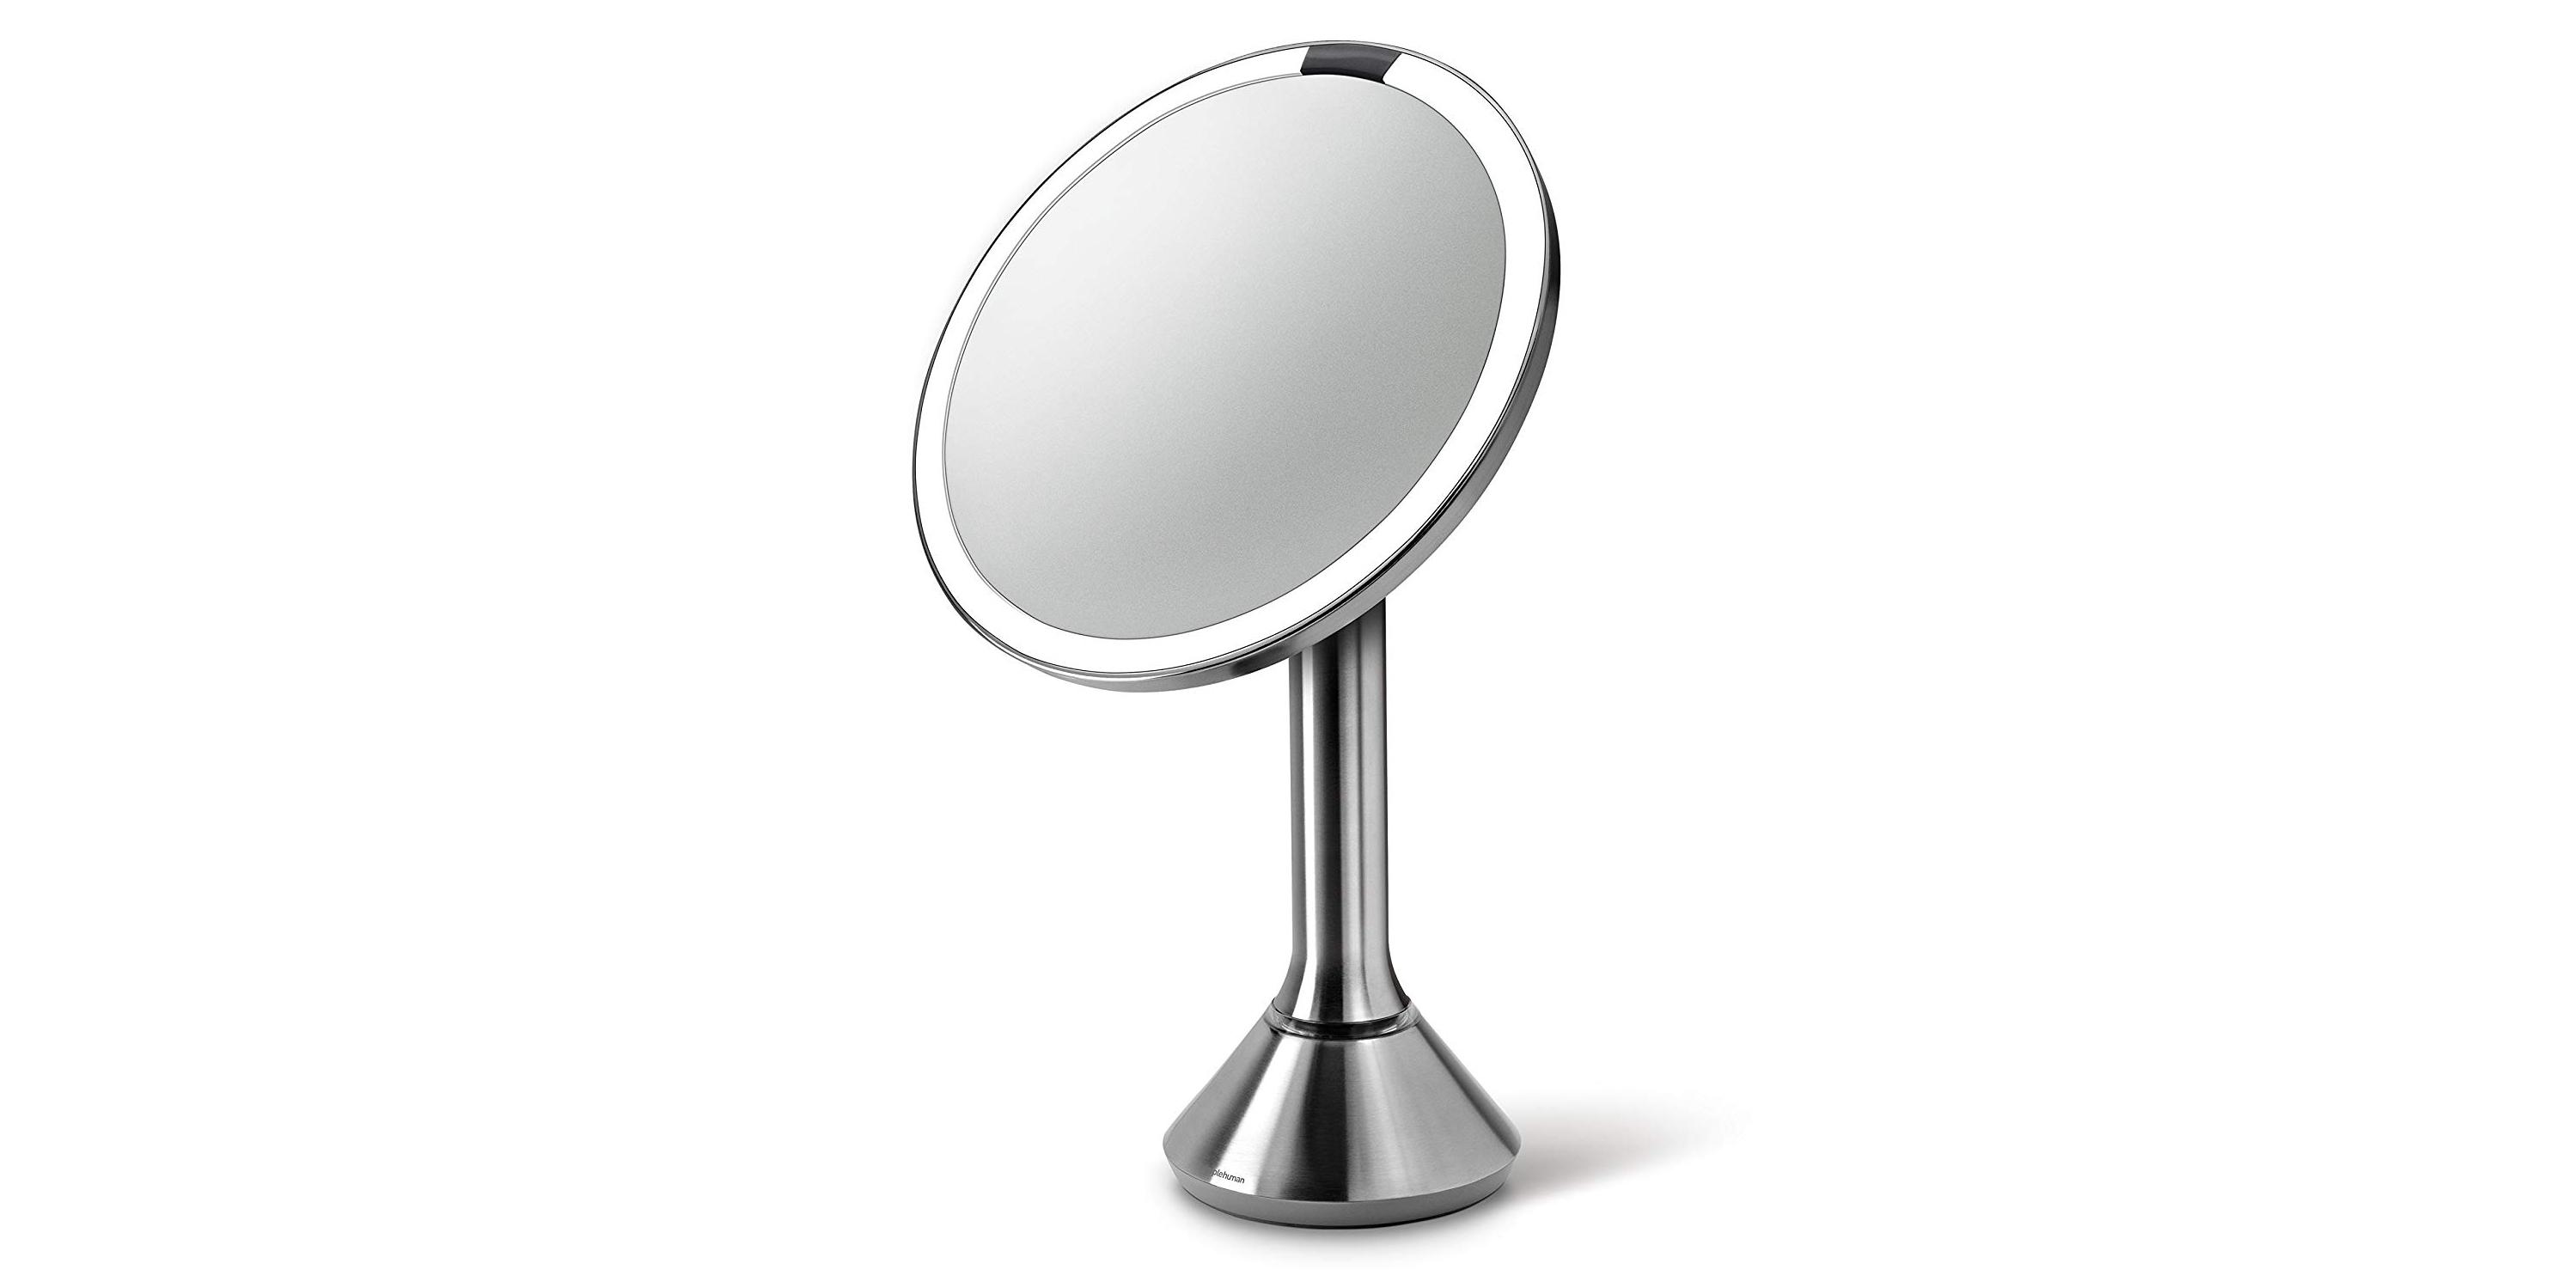 Take your bathroom to the next level w/ a simplehuman smart sensor mirror for $140 (Reg. $200)